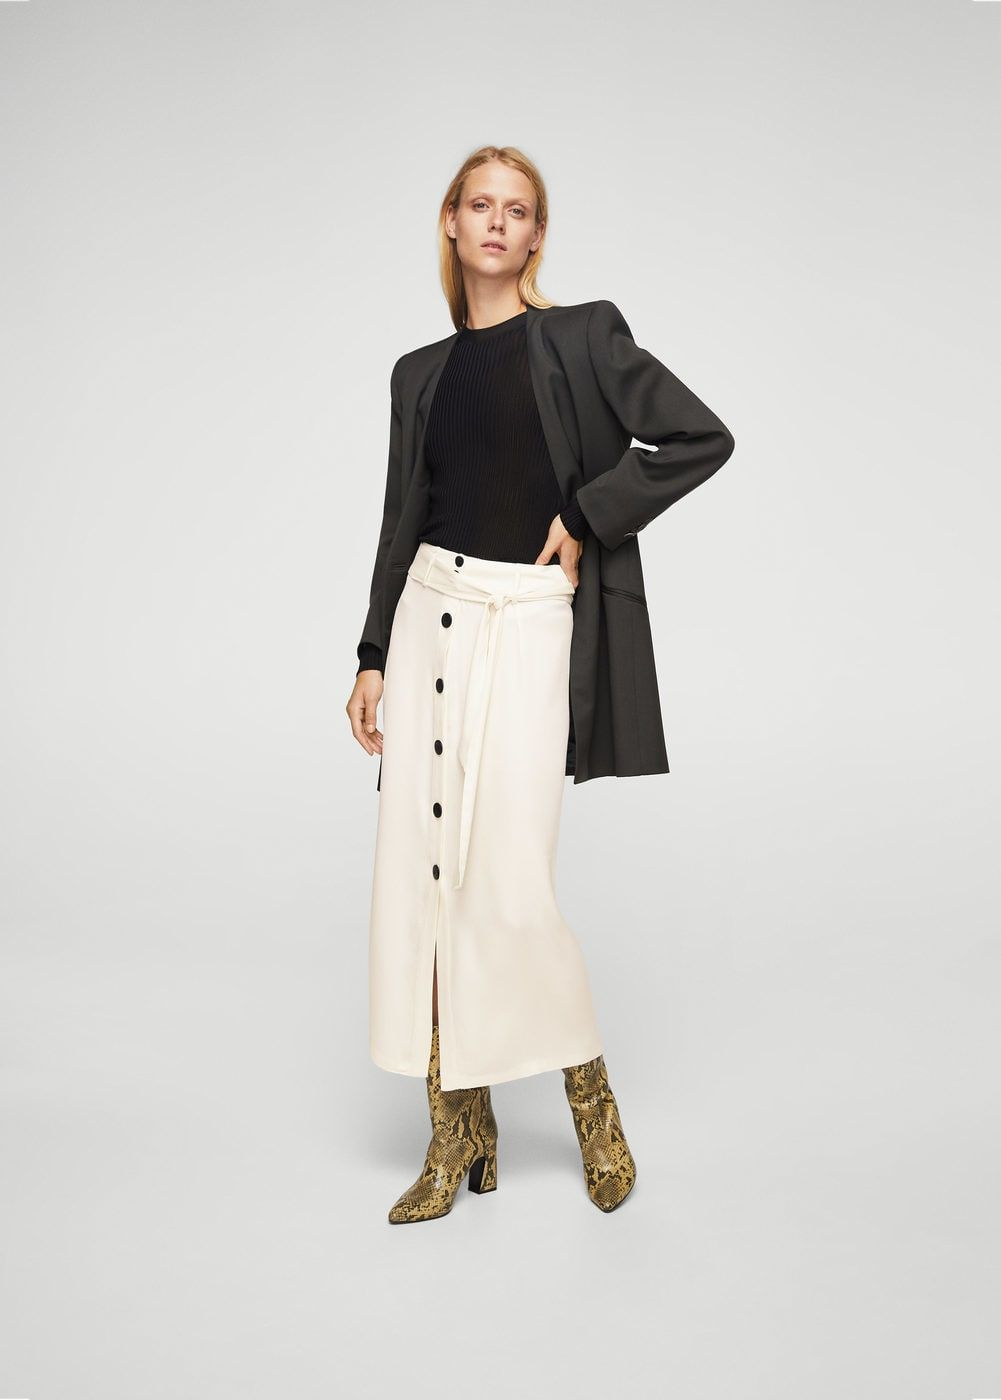 Cupro Skirt - COULEURS DAUTOMNE by VIDA VIDA Finishline Online Free Shipping For Sale D5hIux